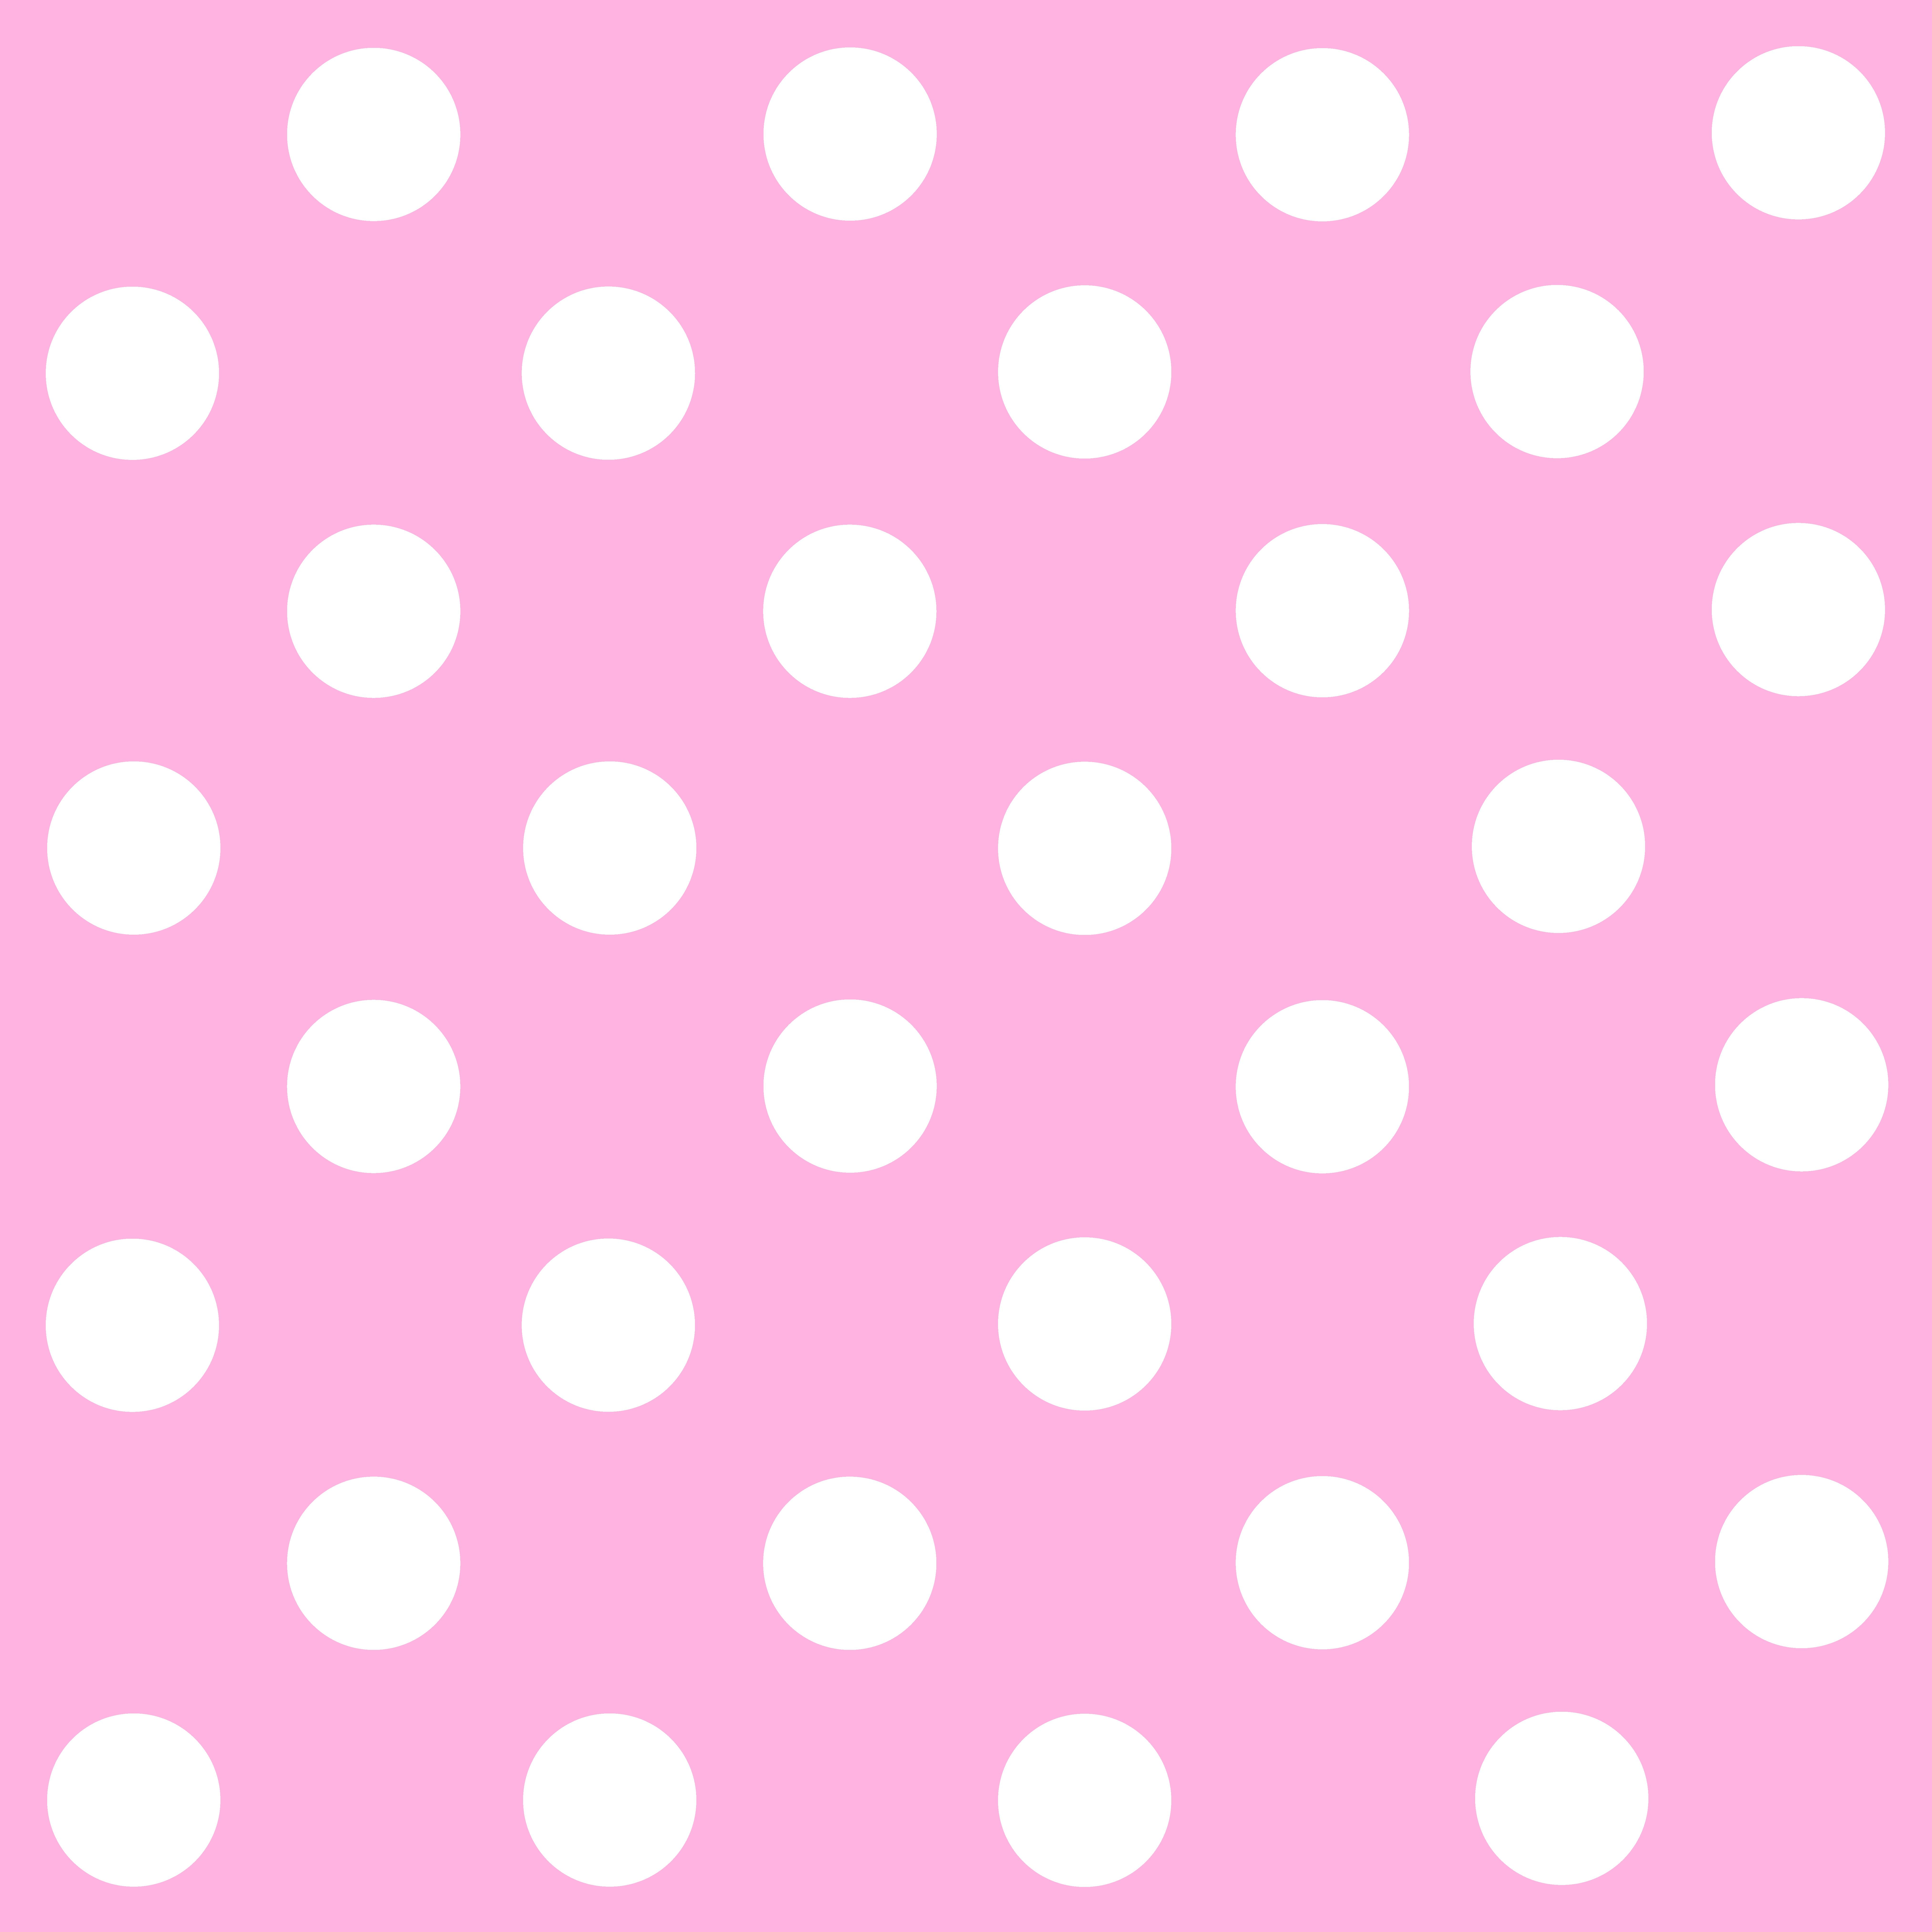 25+ Polka Dot Clip Art.